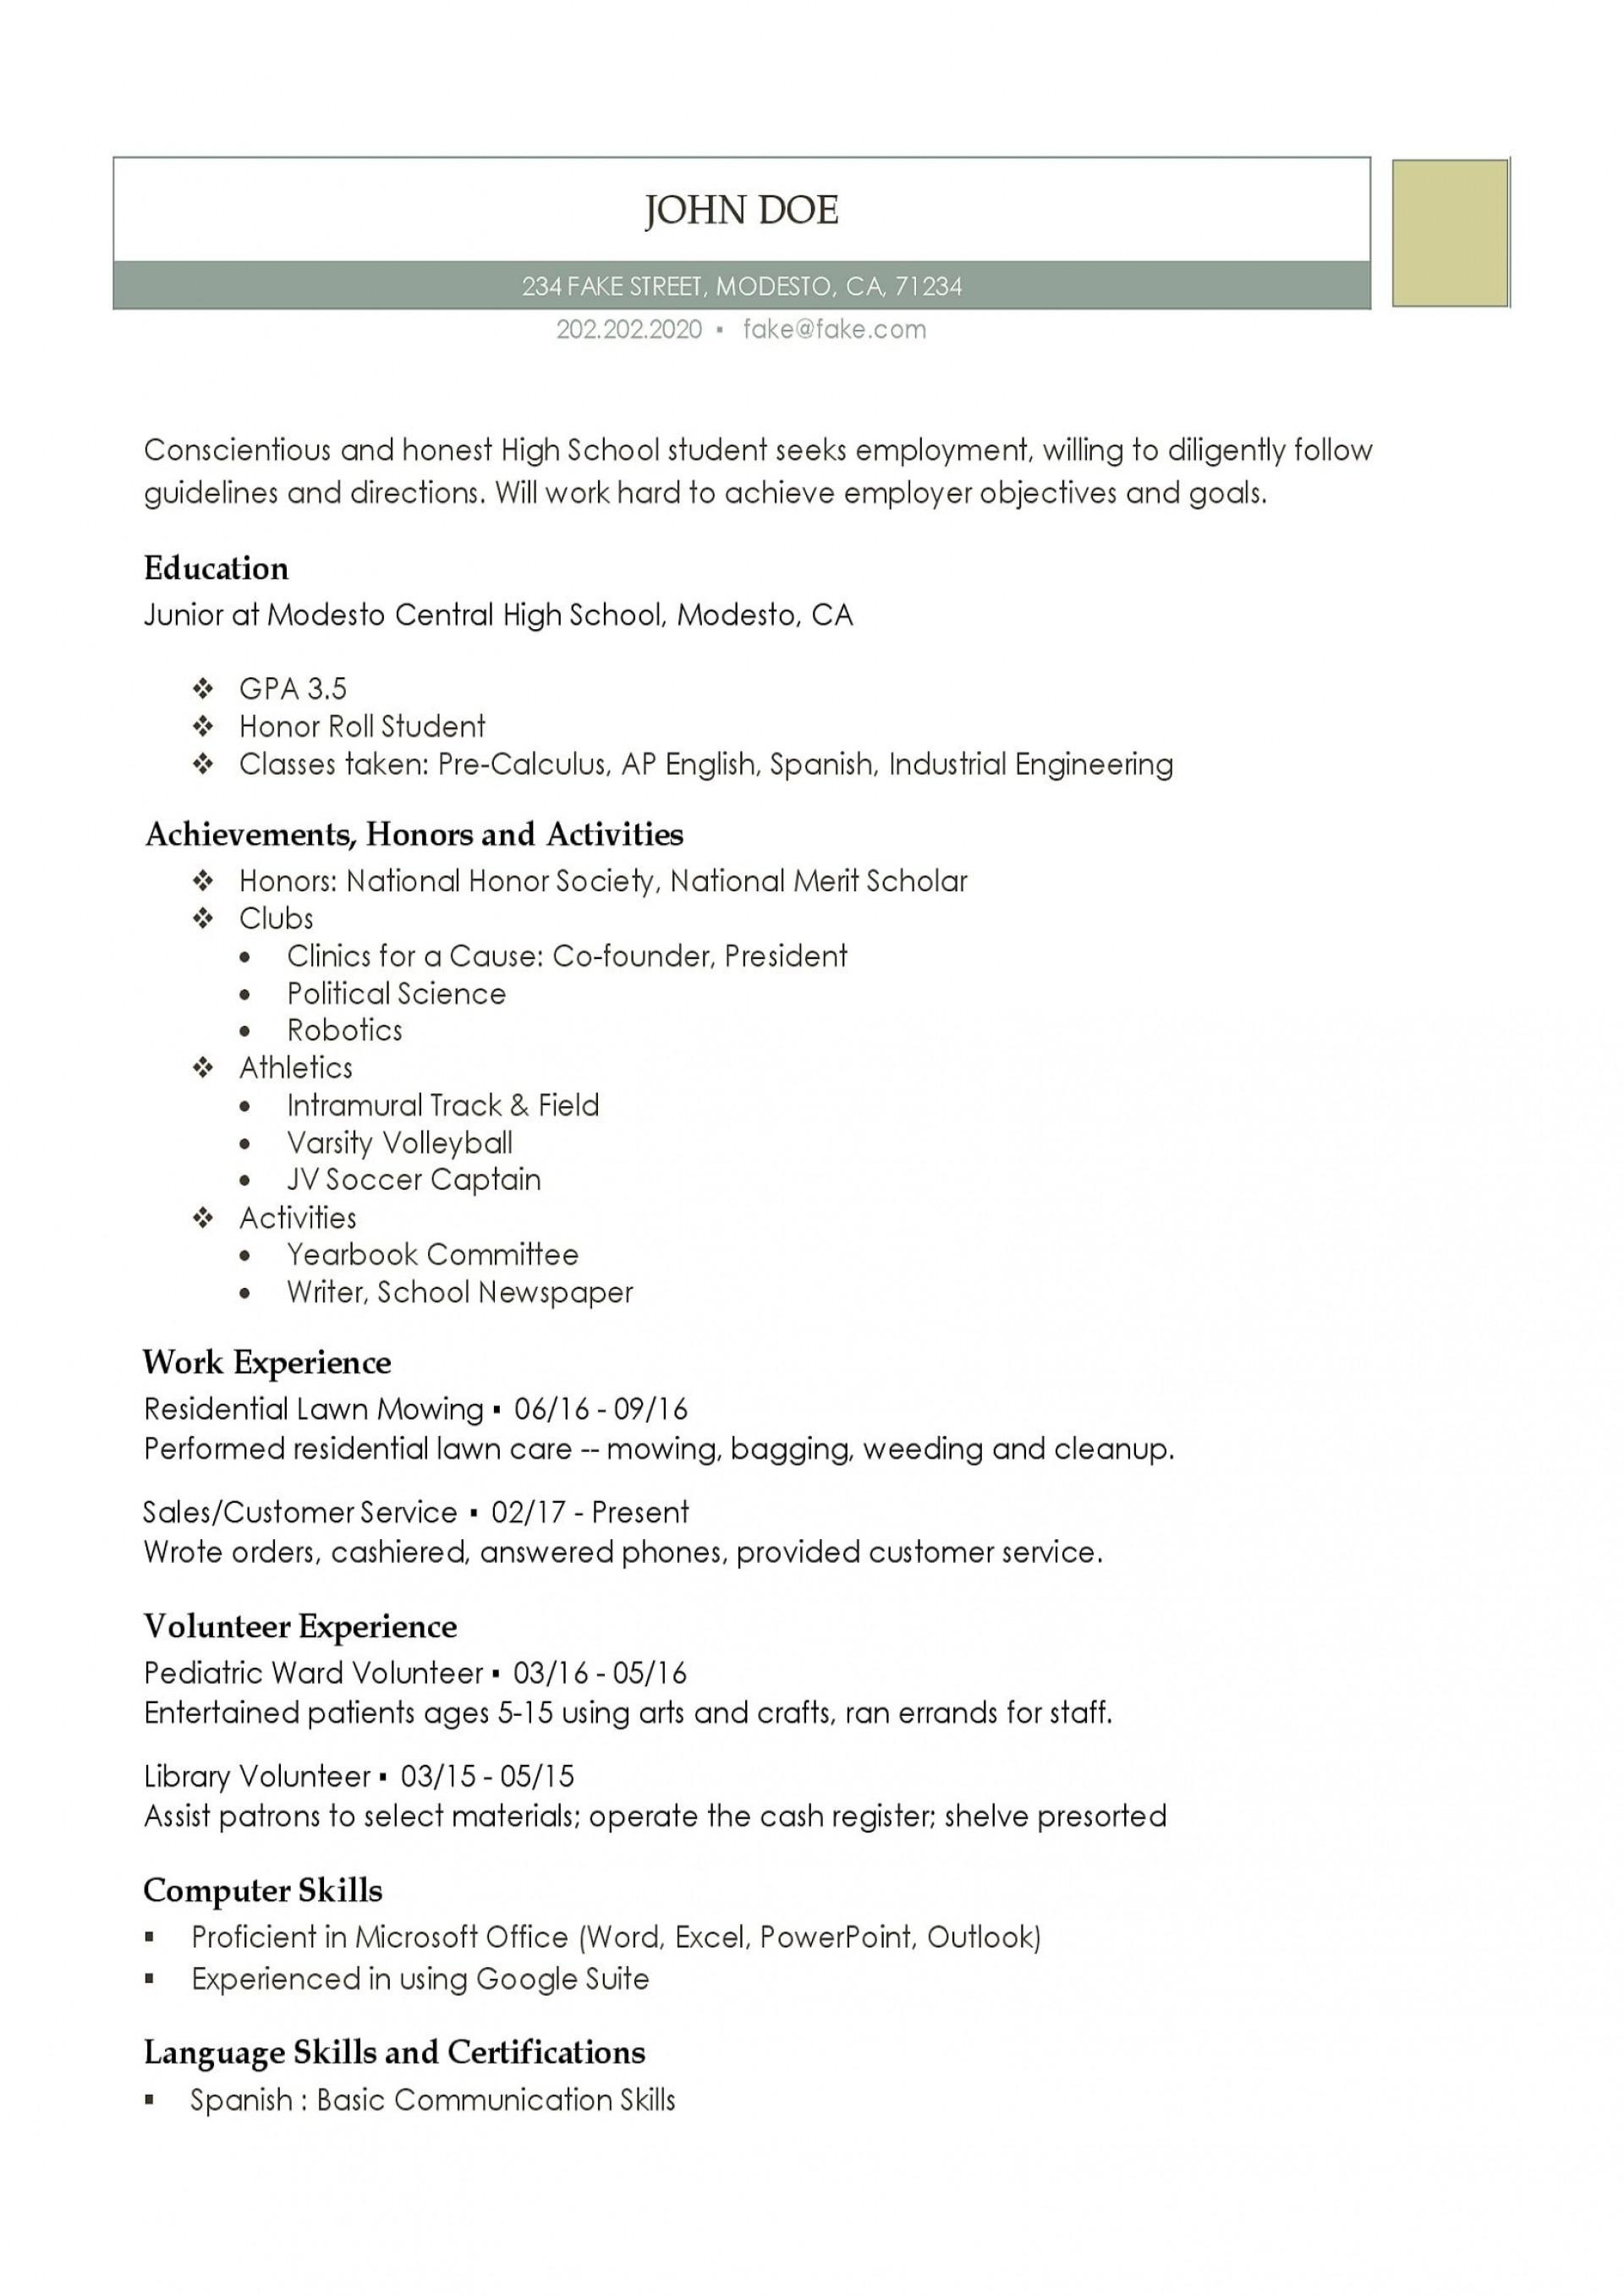 001 Formidable Resume Template High School Resolution  Student Australia For Google Doc Graduate Microsoft Word1920